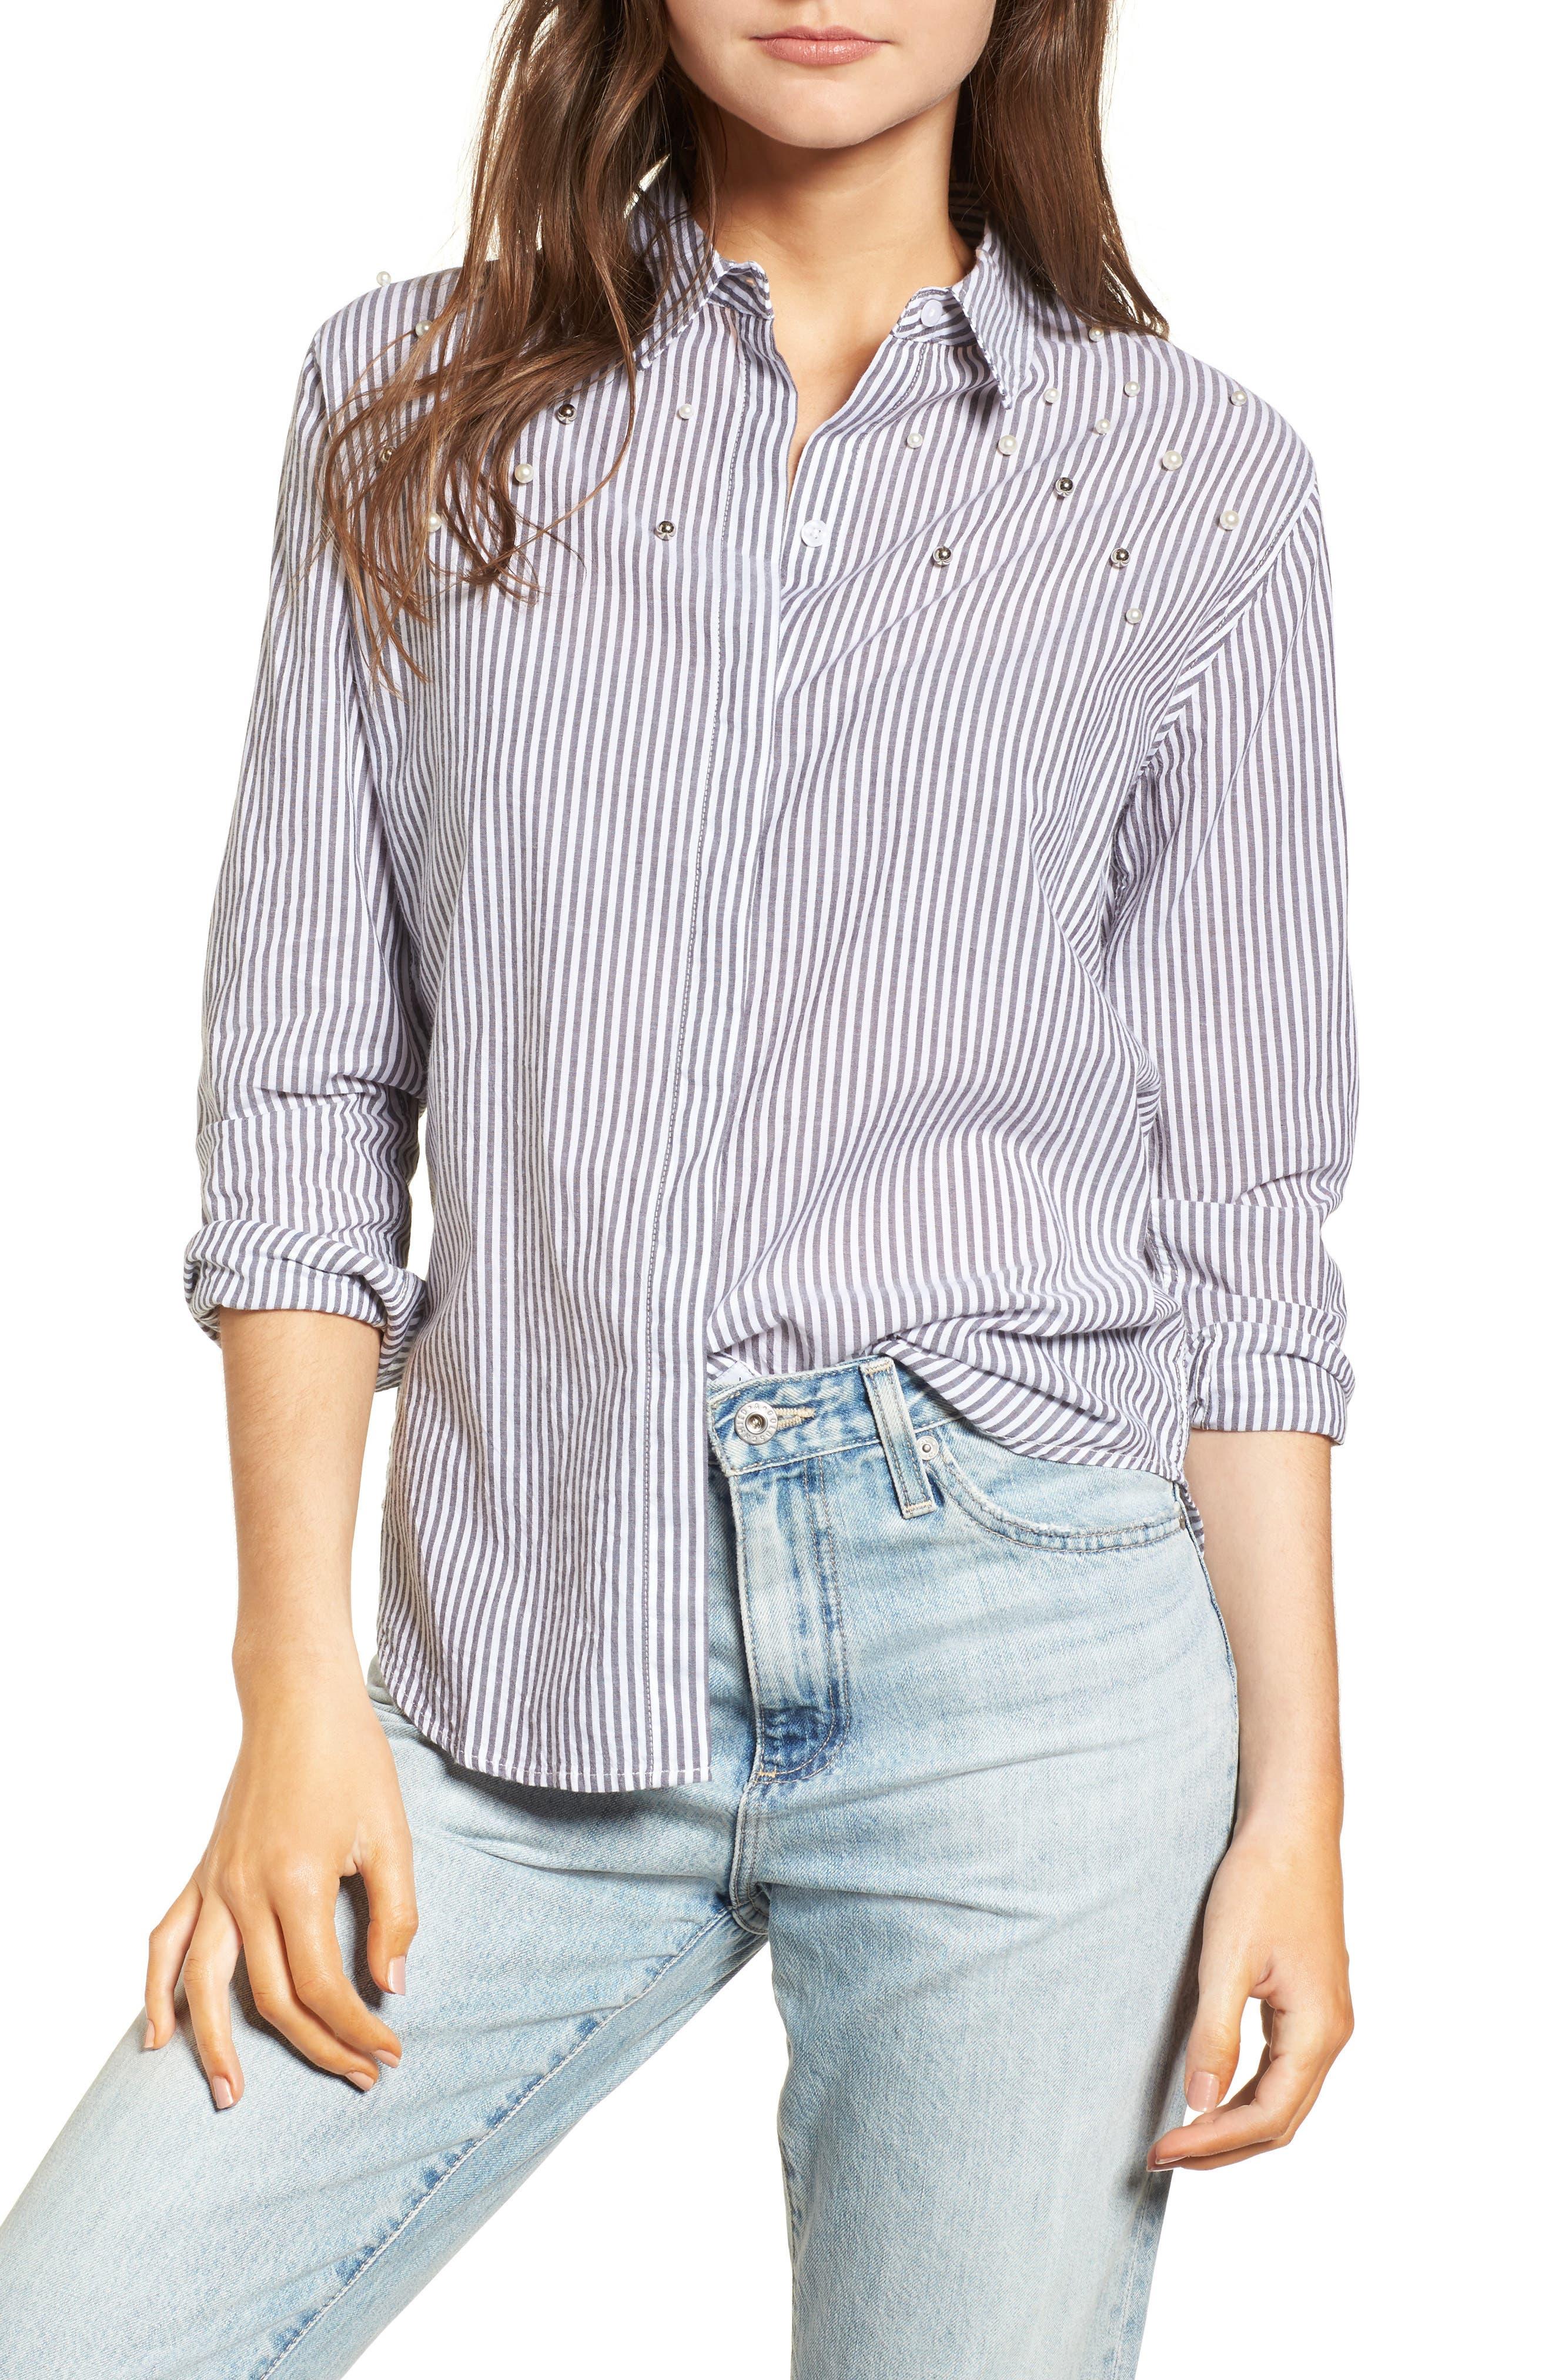 Taylor Embellished Shirt,                         Main,                         color, Florence Stripe Studded Pearls